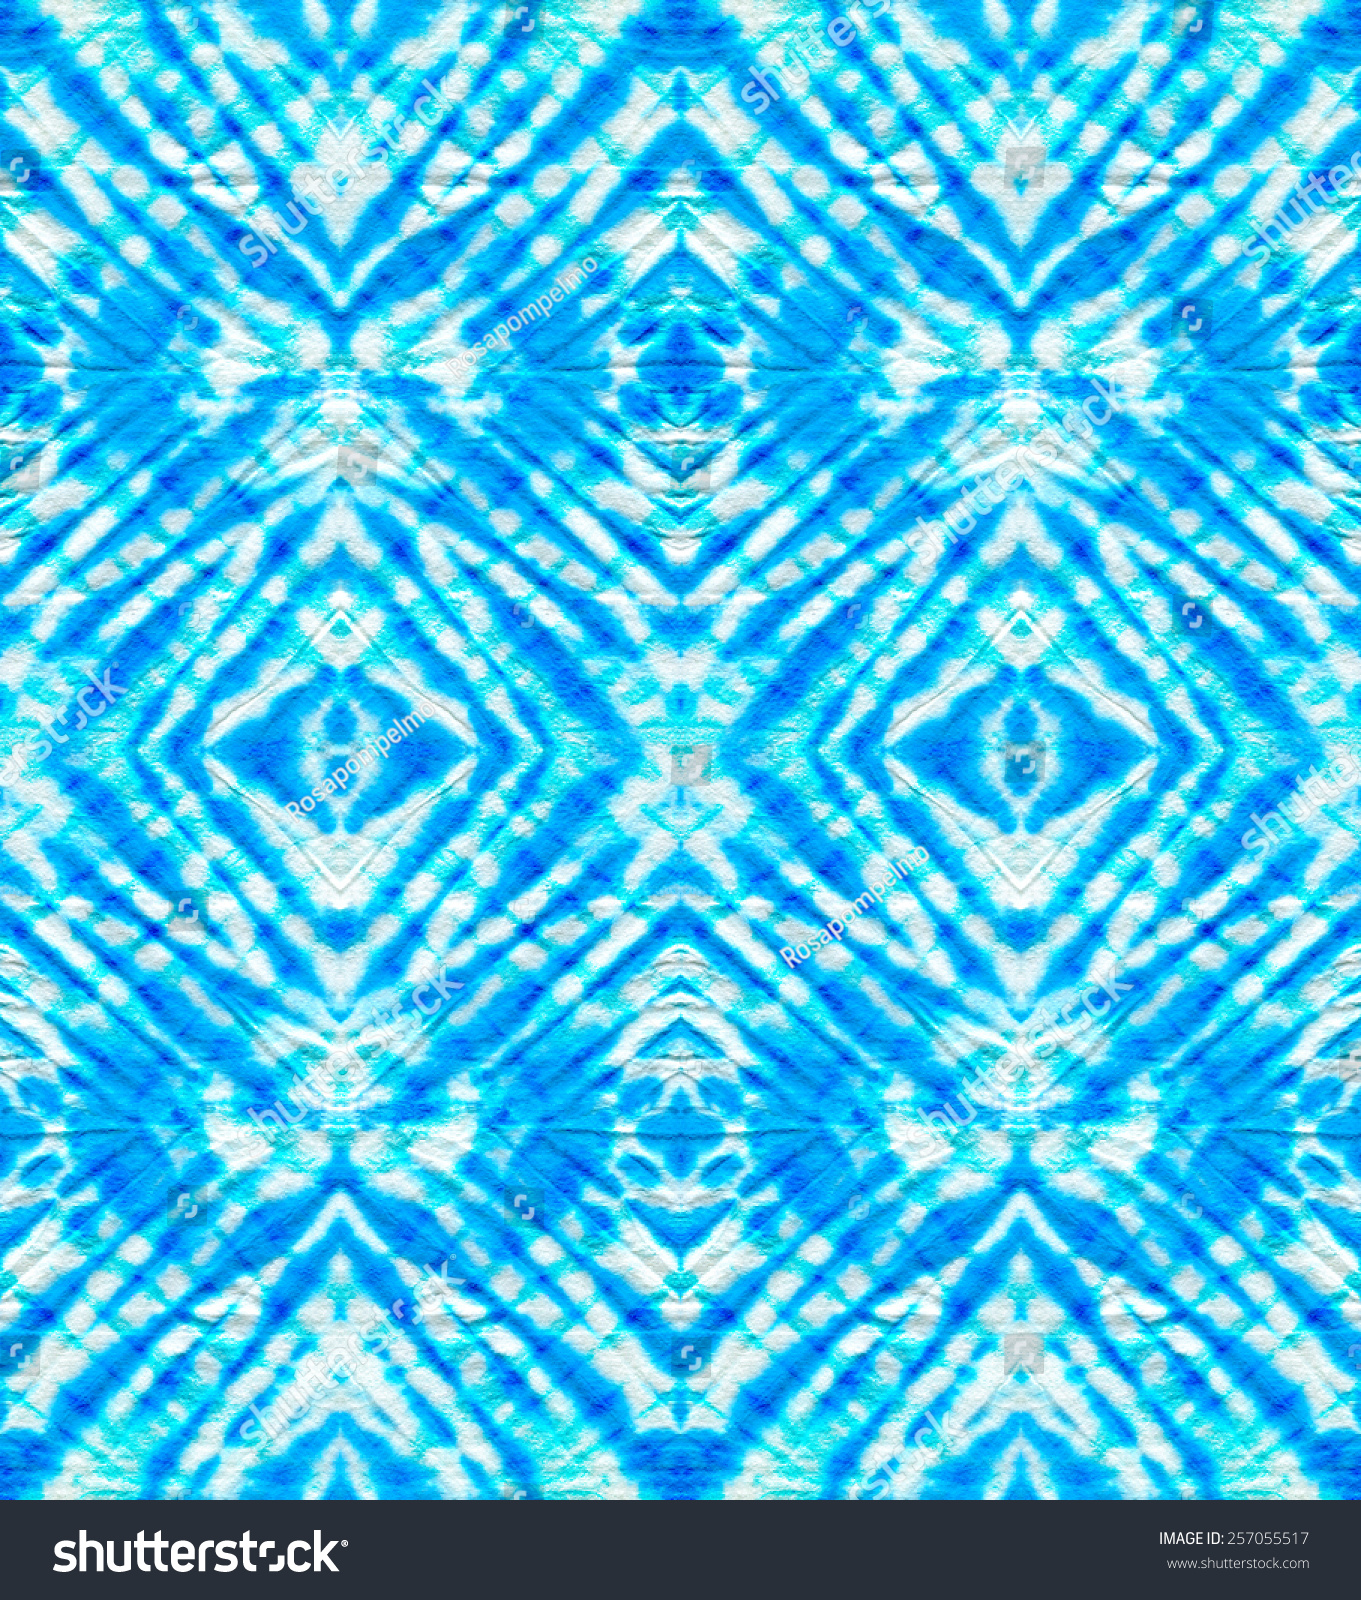 seamless repeating tie dye - photo #16